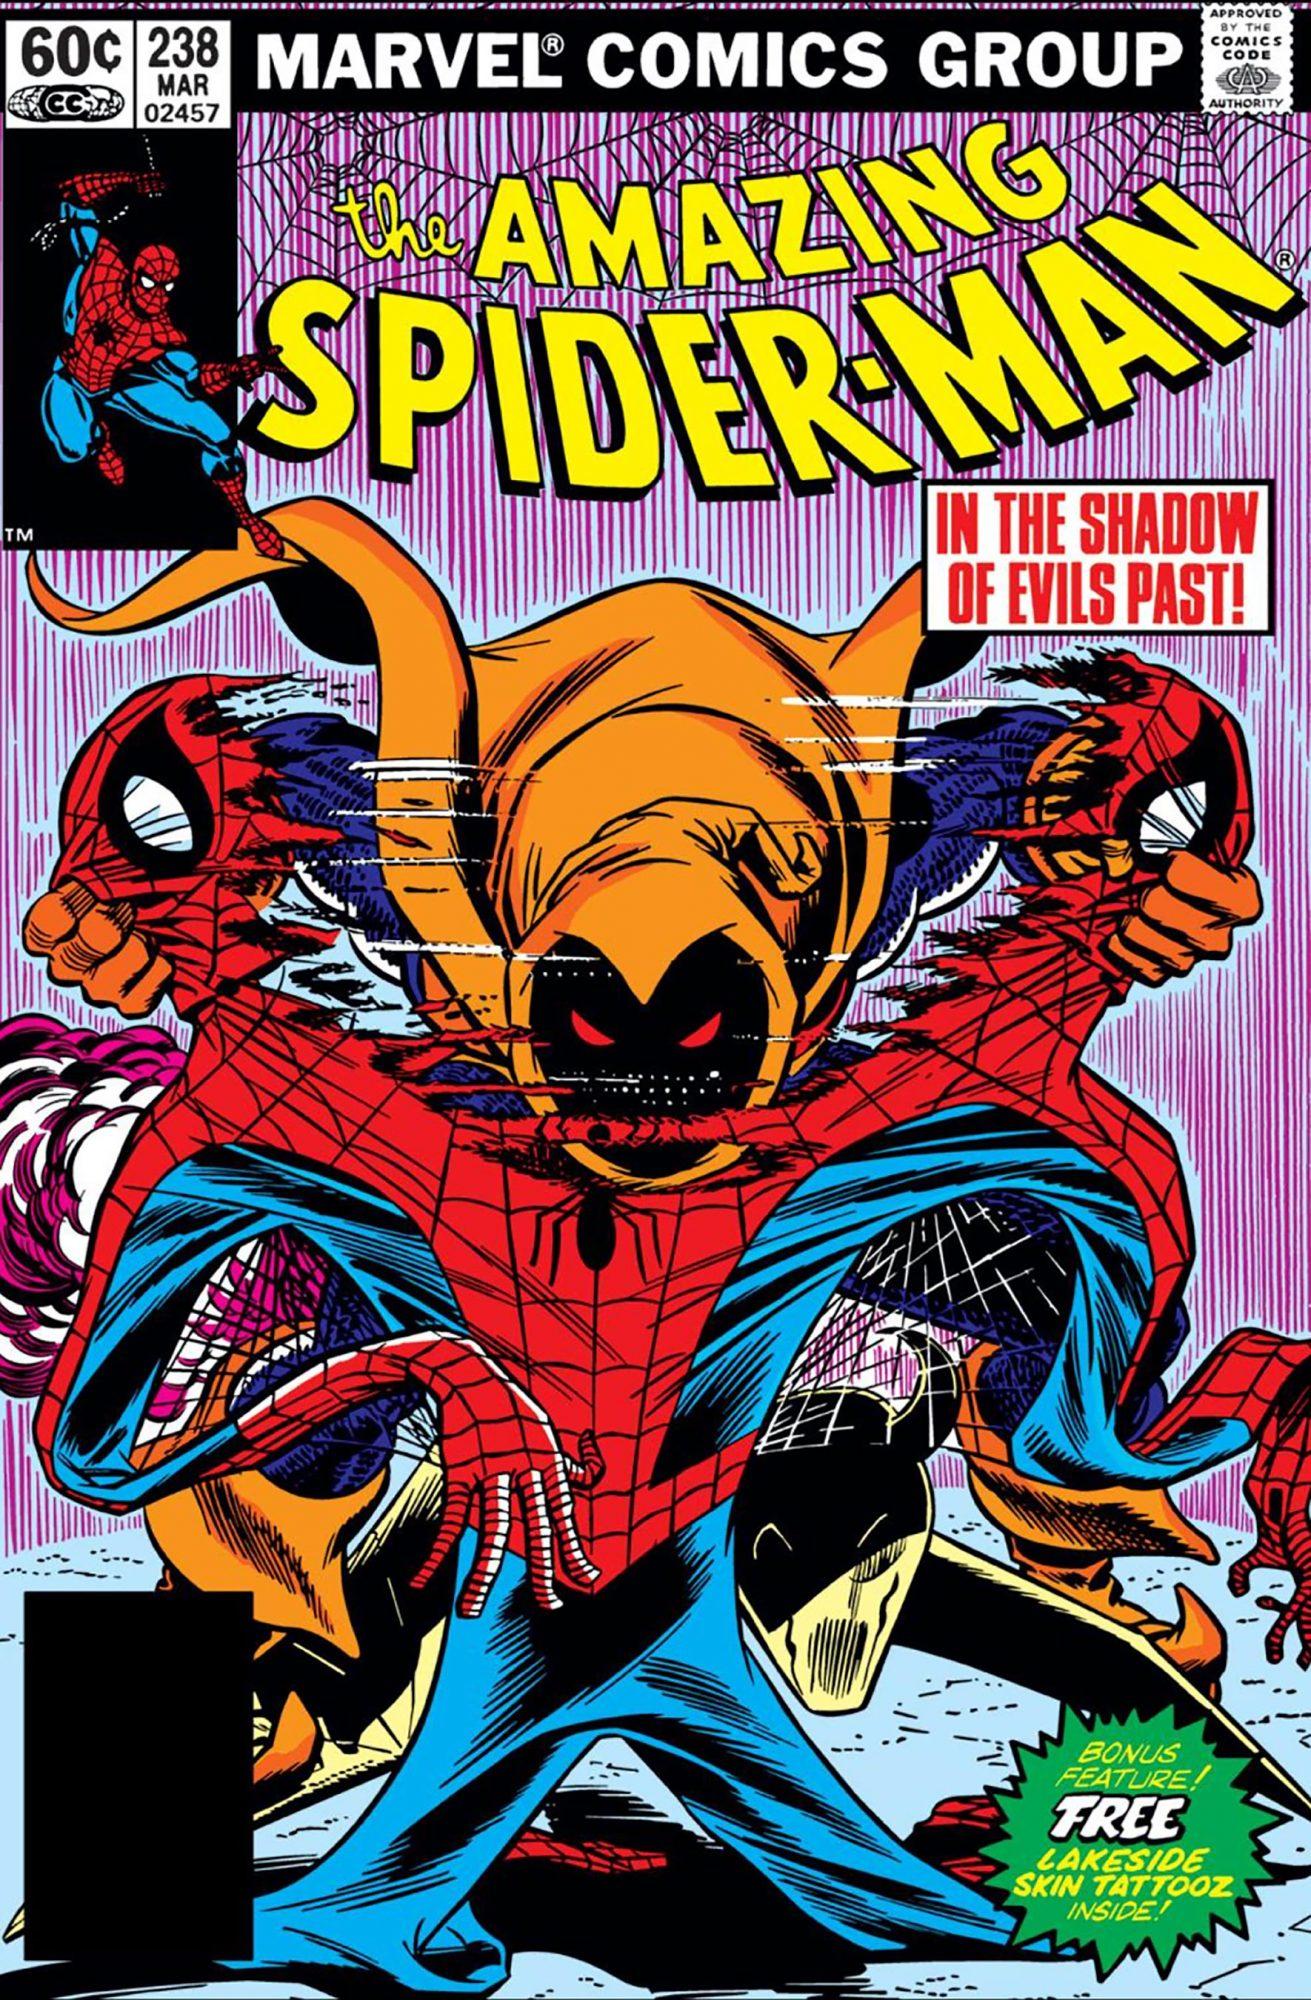 Amazing Spider-Man #238Artist: John Romita Jr., 1983